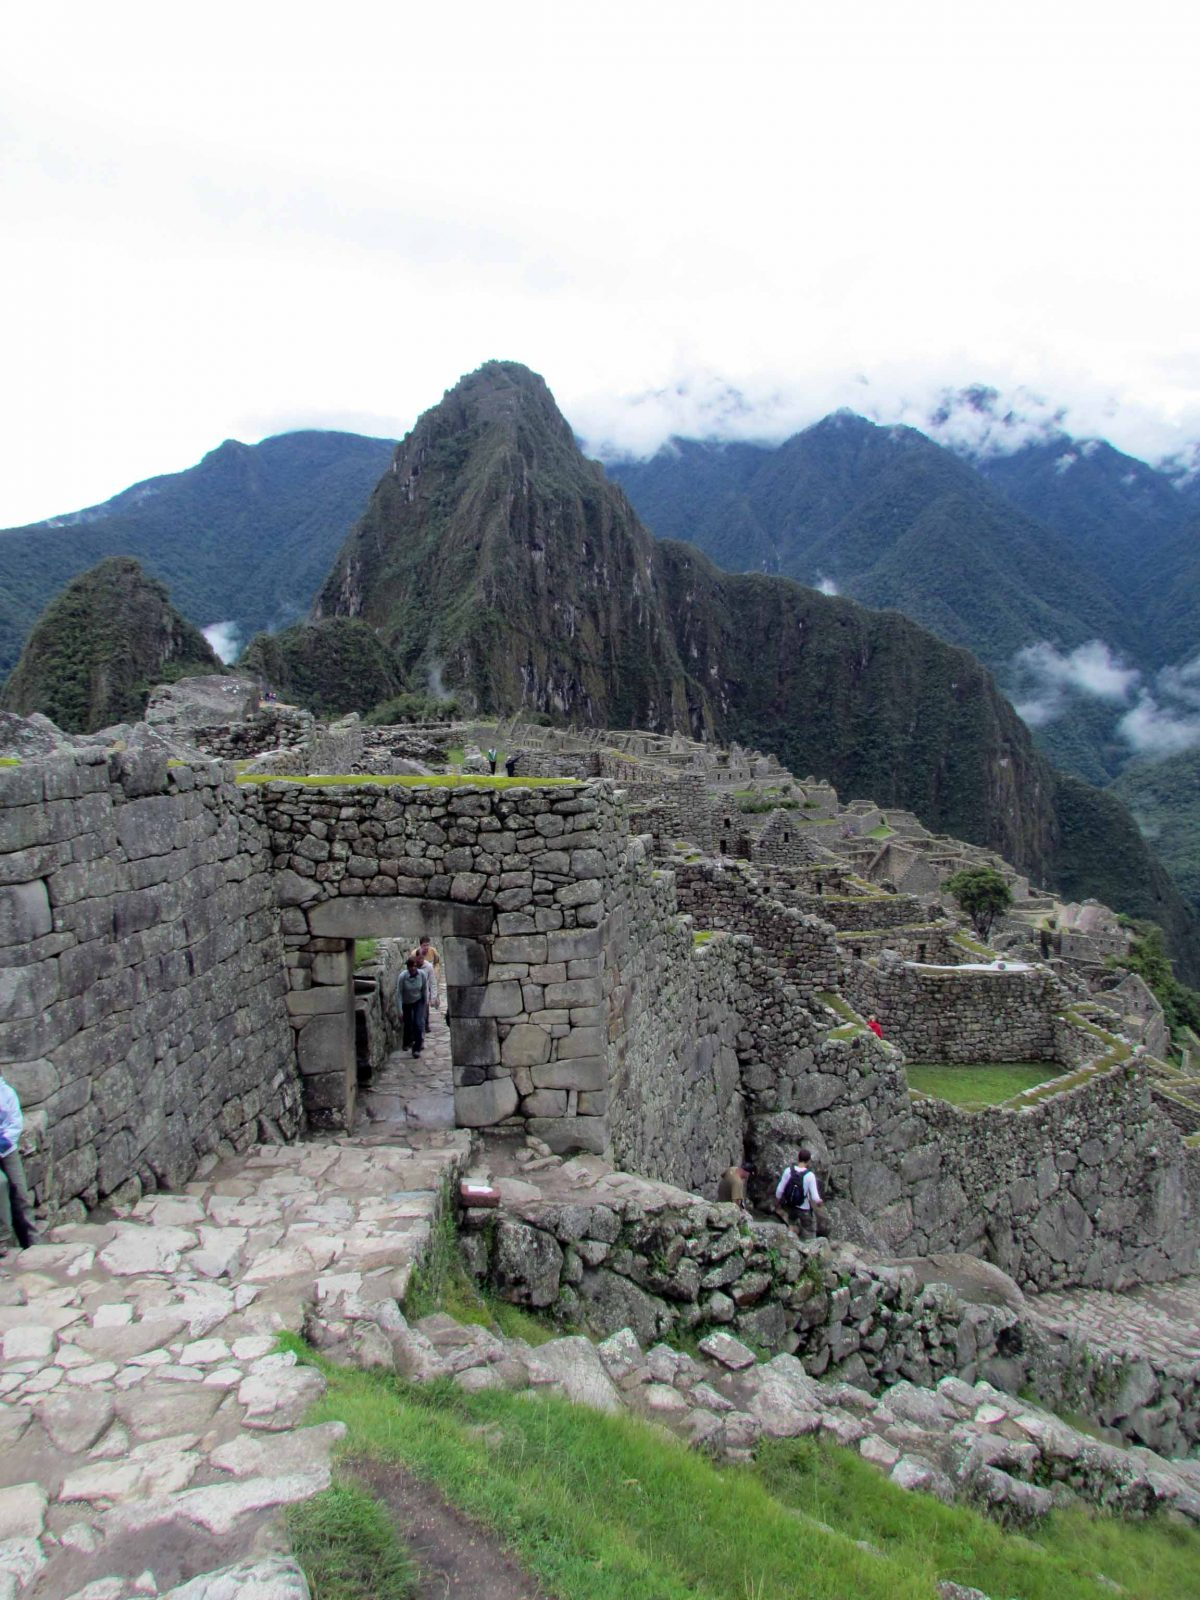 Wayna Picchu stands behind Machu Picchu, Peru | ©Angela Drake